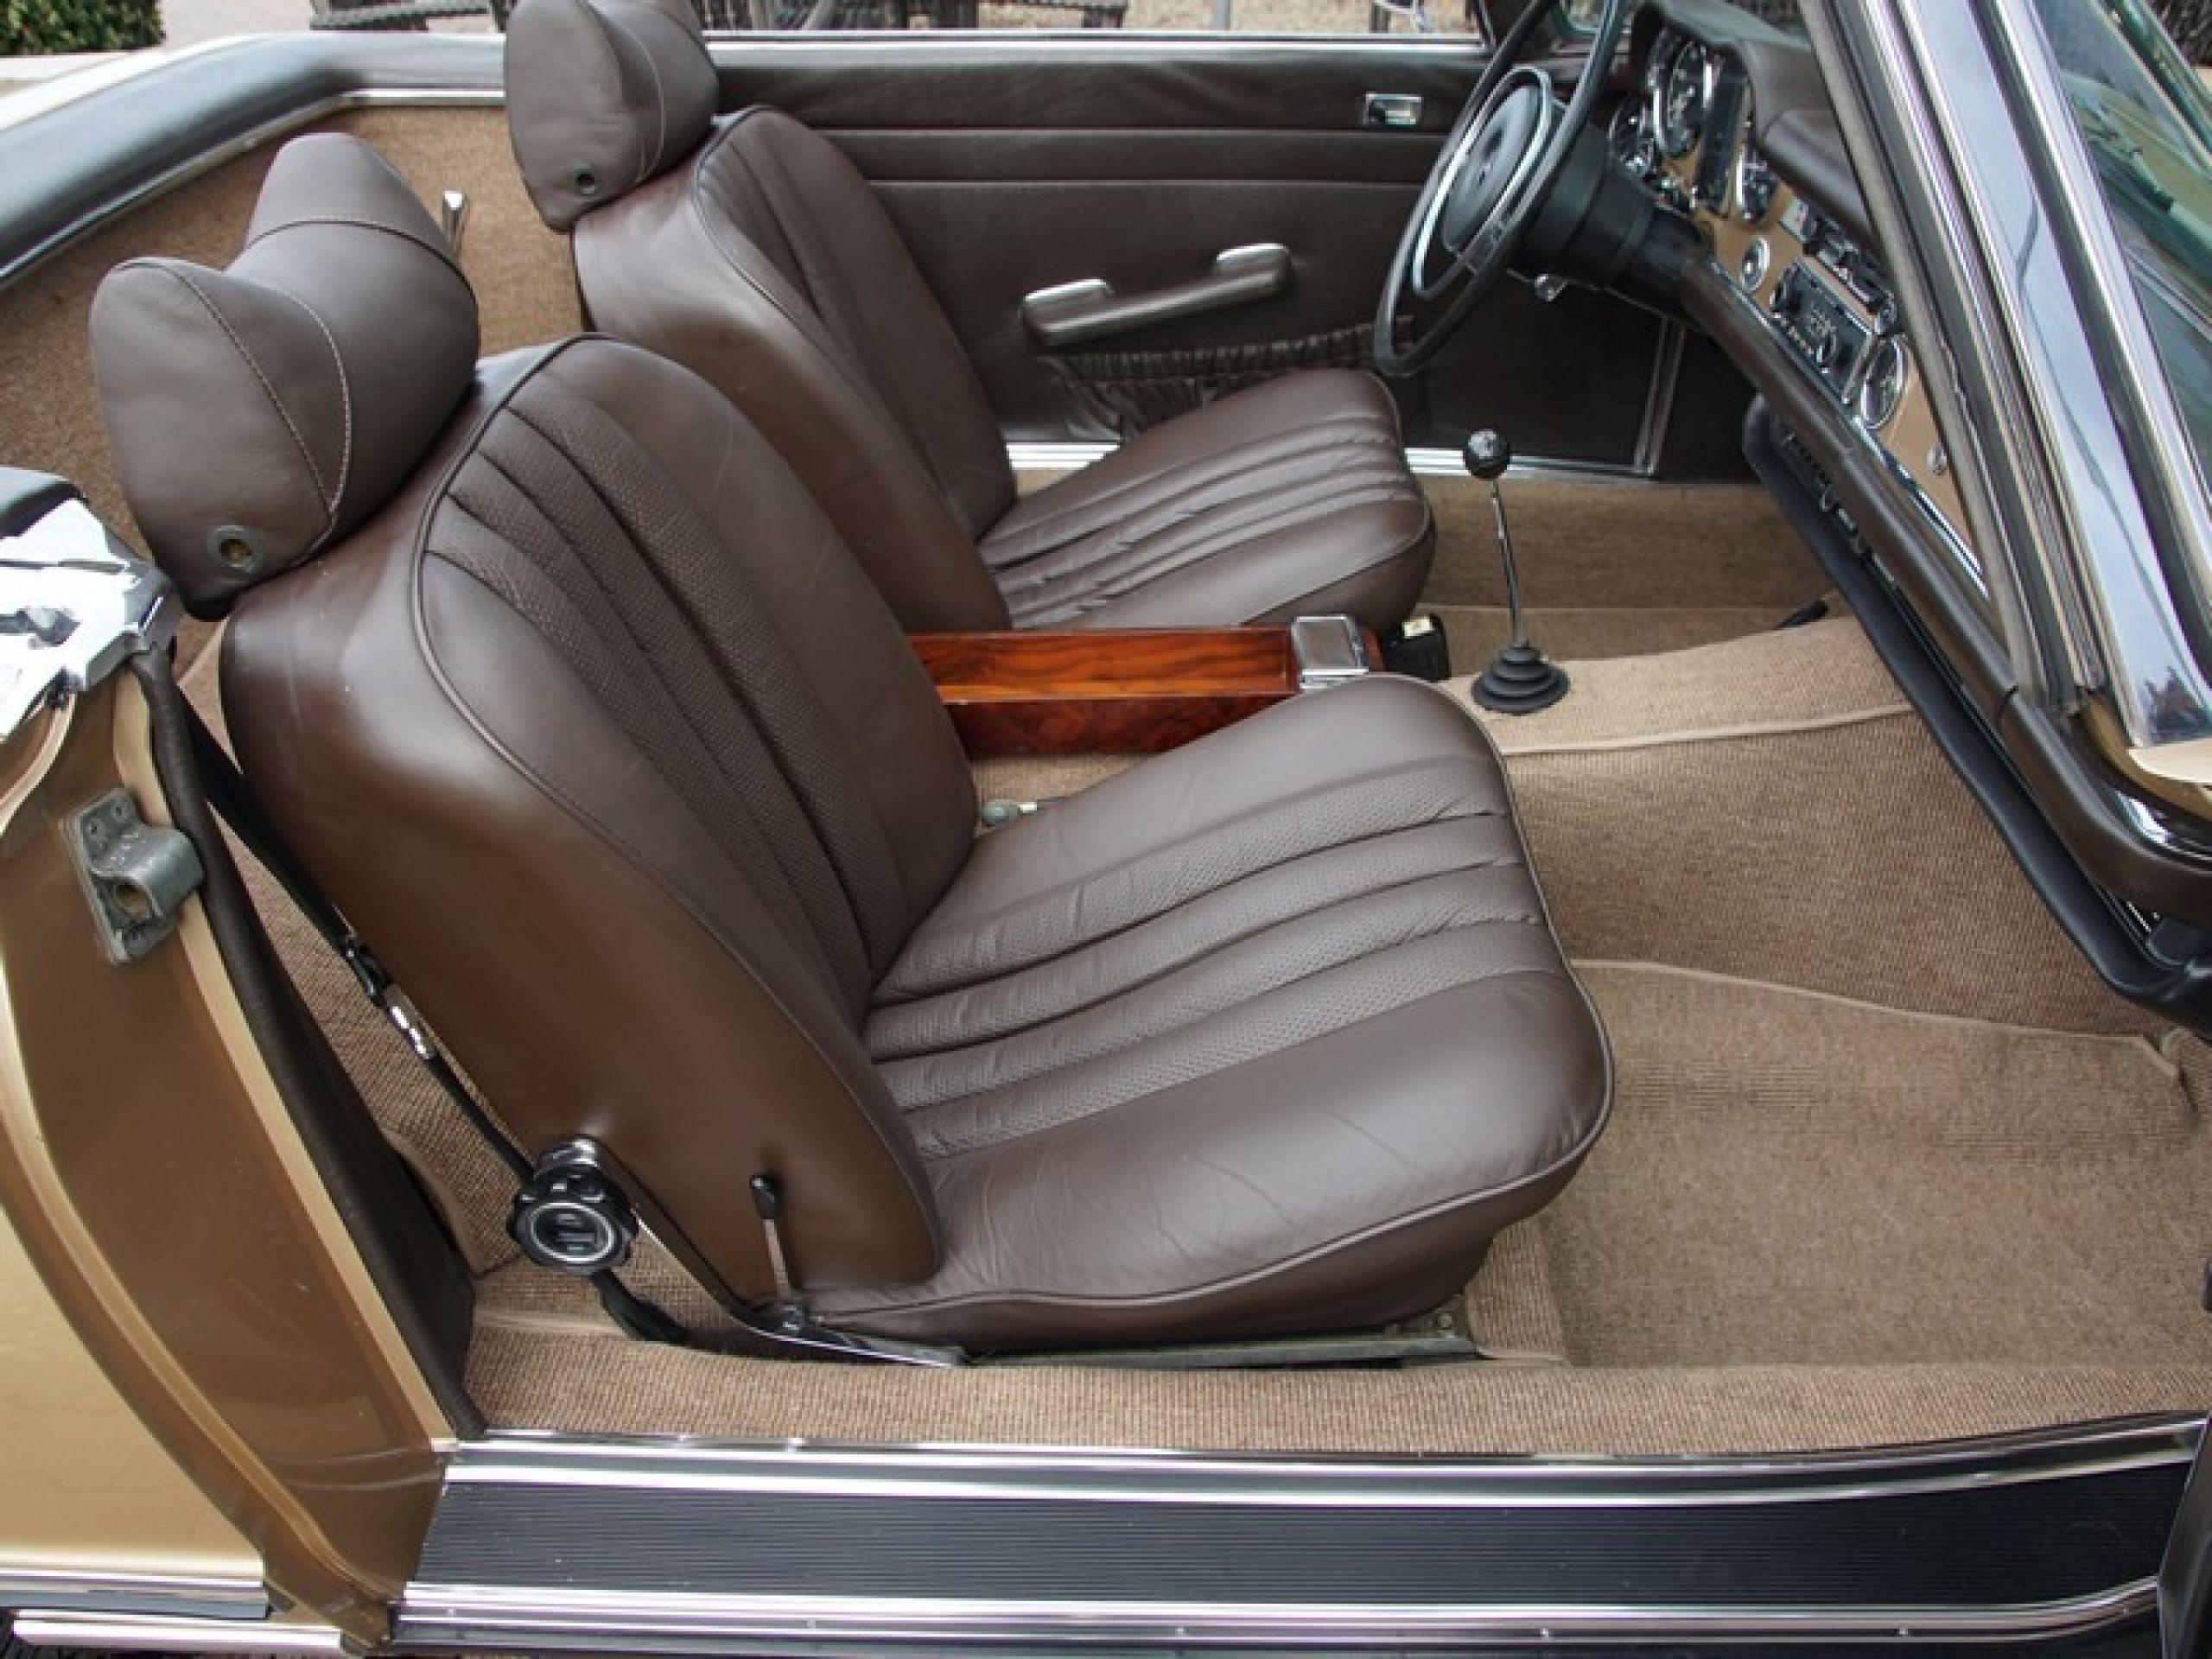 Mercedes Benz 280SL Pagode (1969)